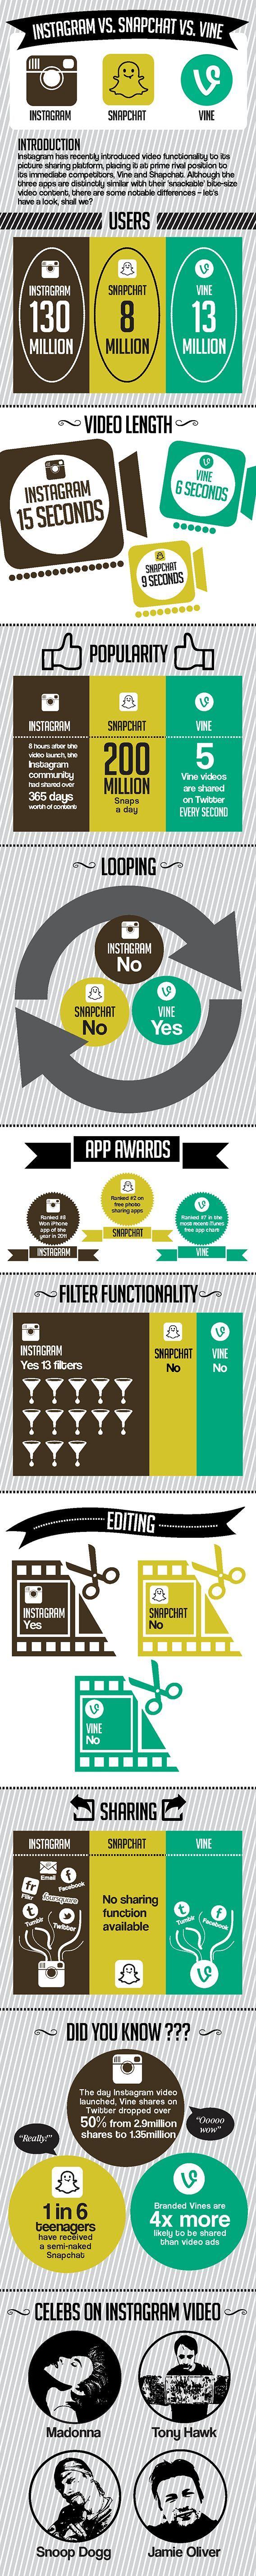 Infografía - Vine, Instagram y Snapchat